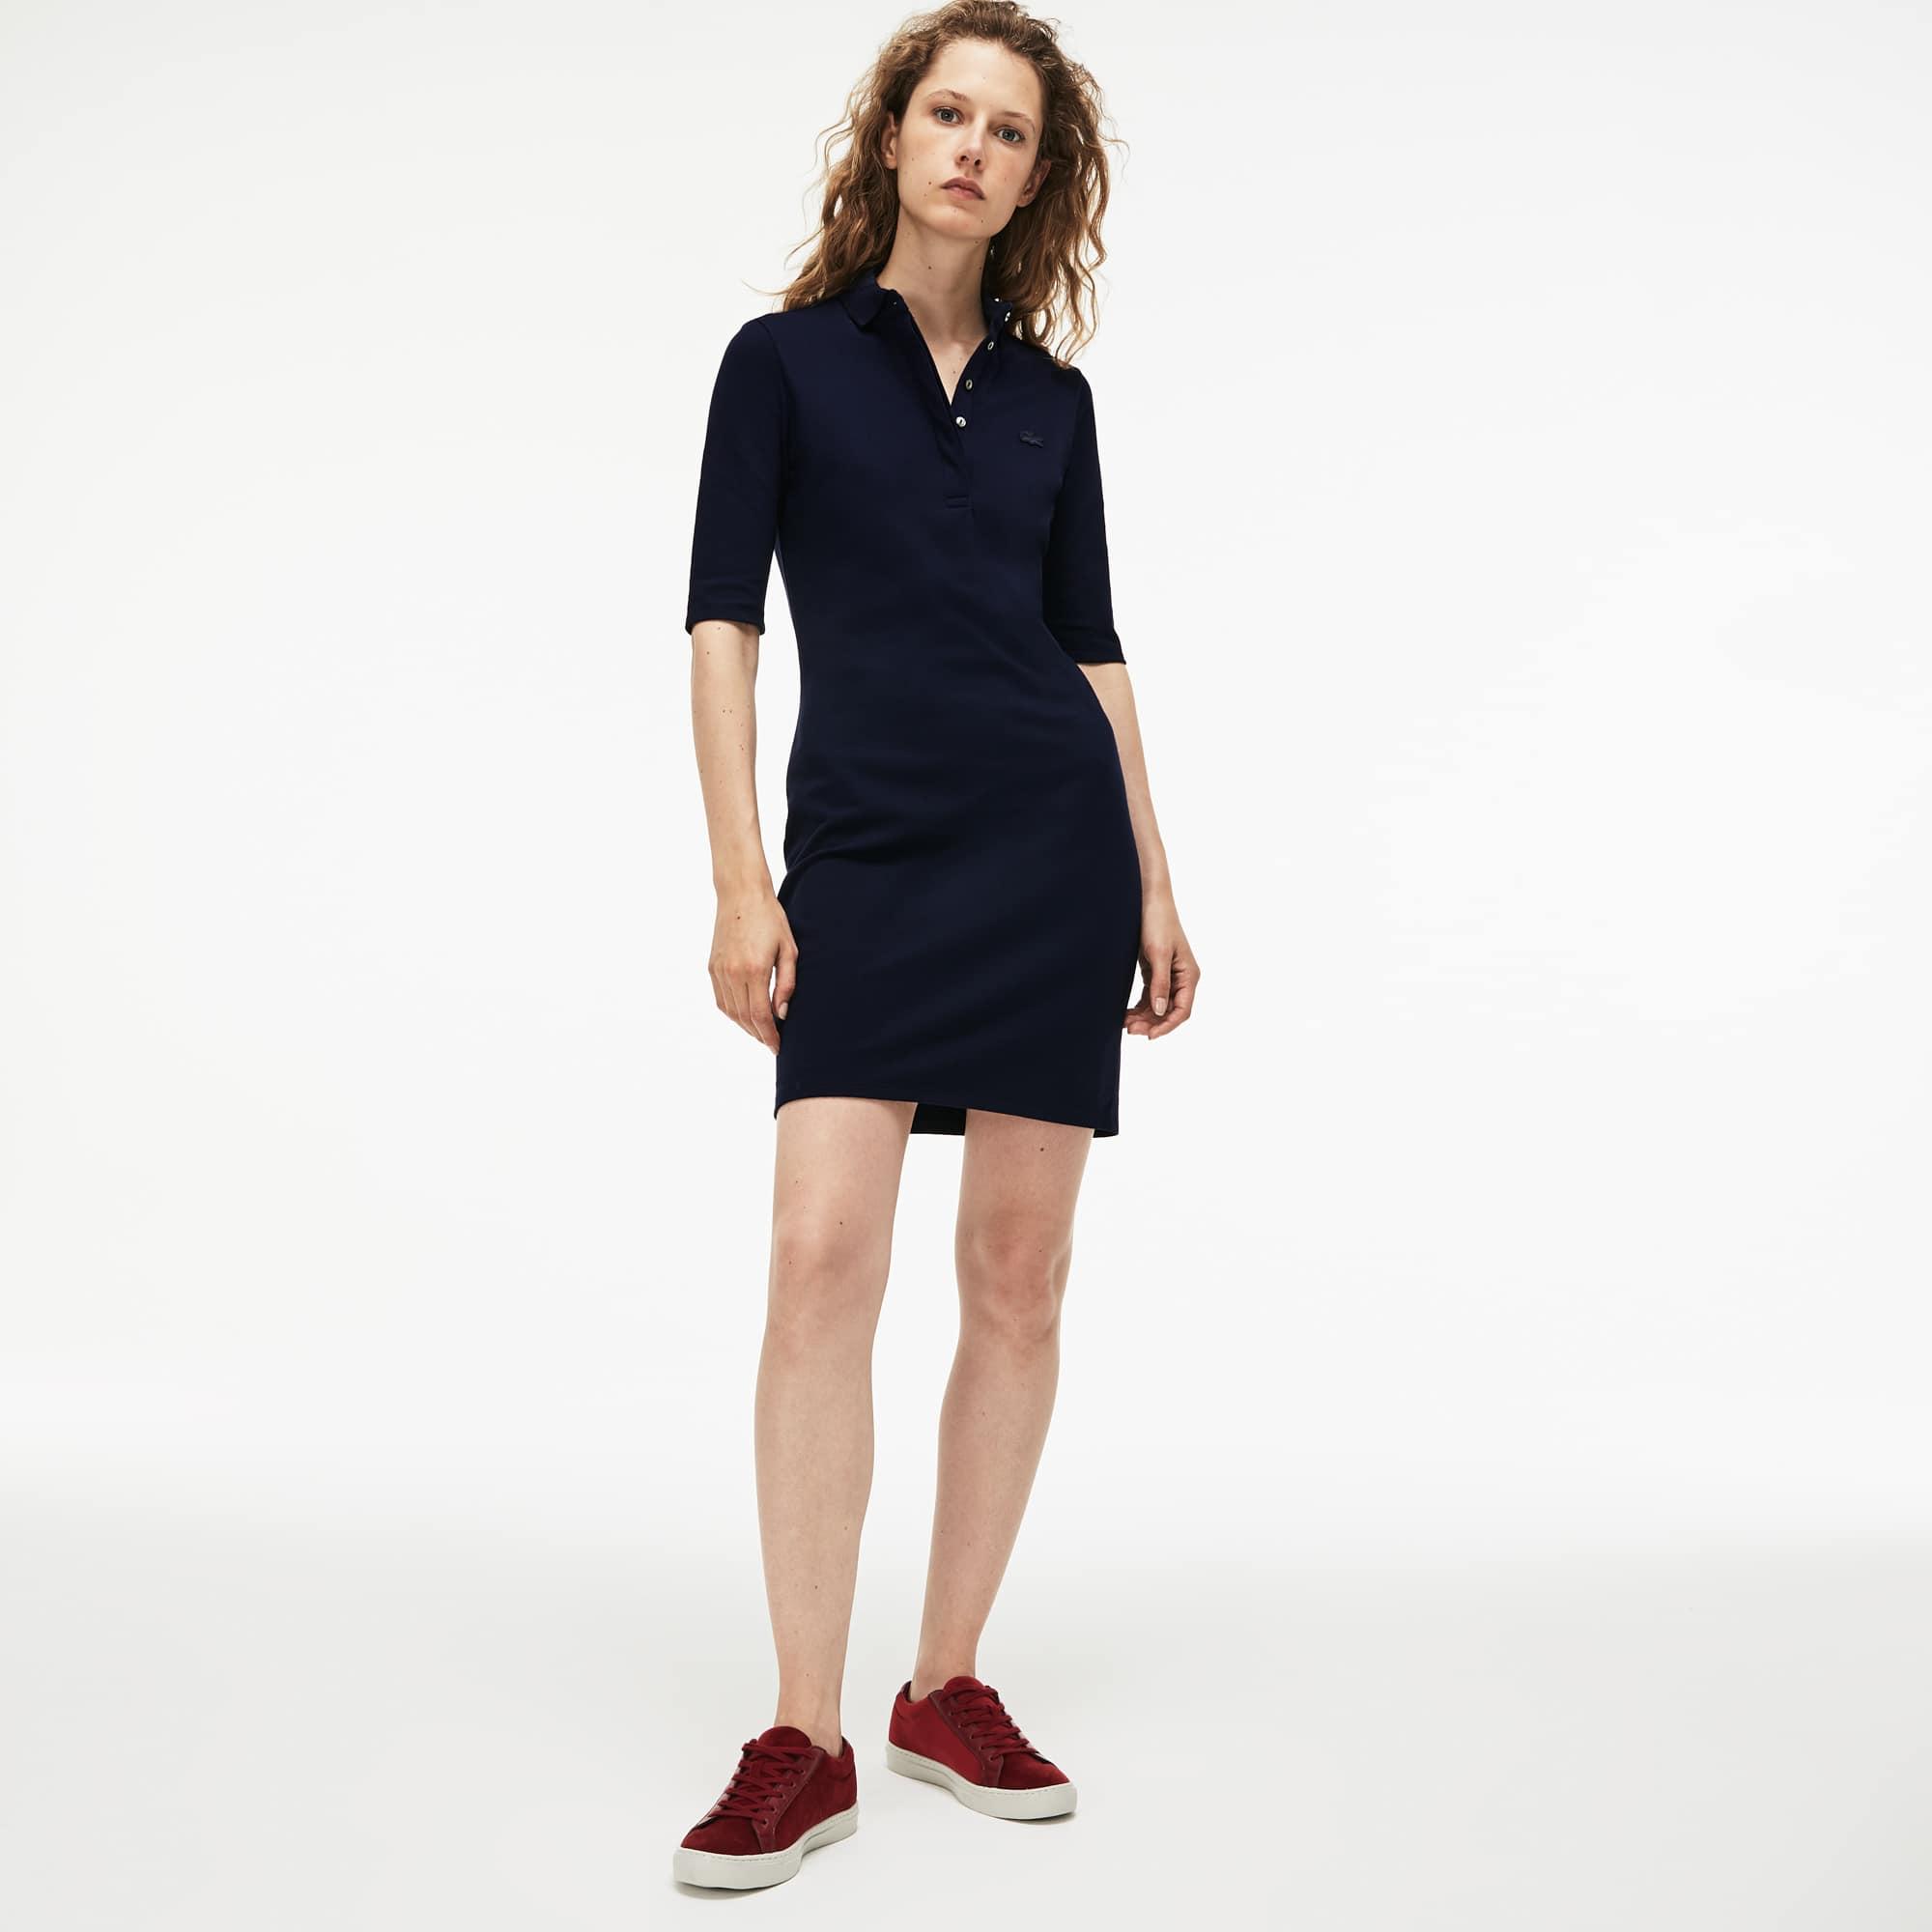 1cf4ec24c6 Women's Dresses & Skirts   Lacoste